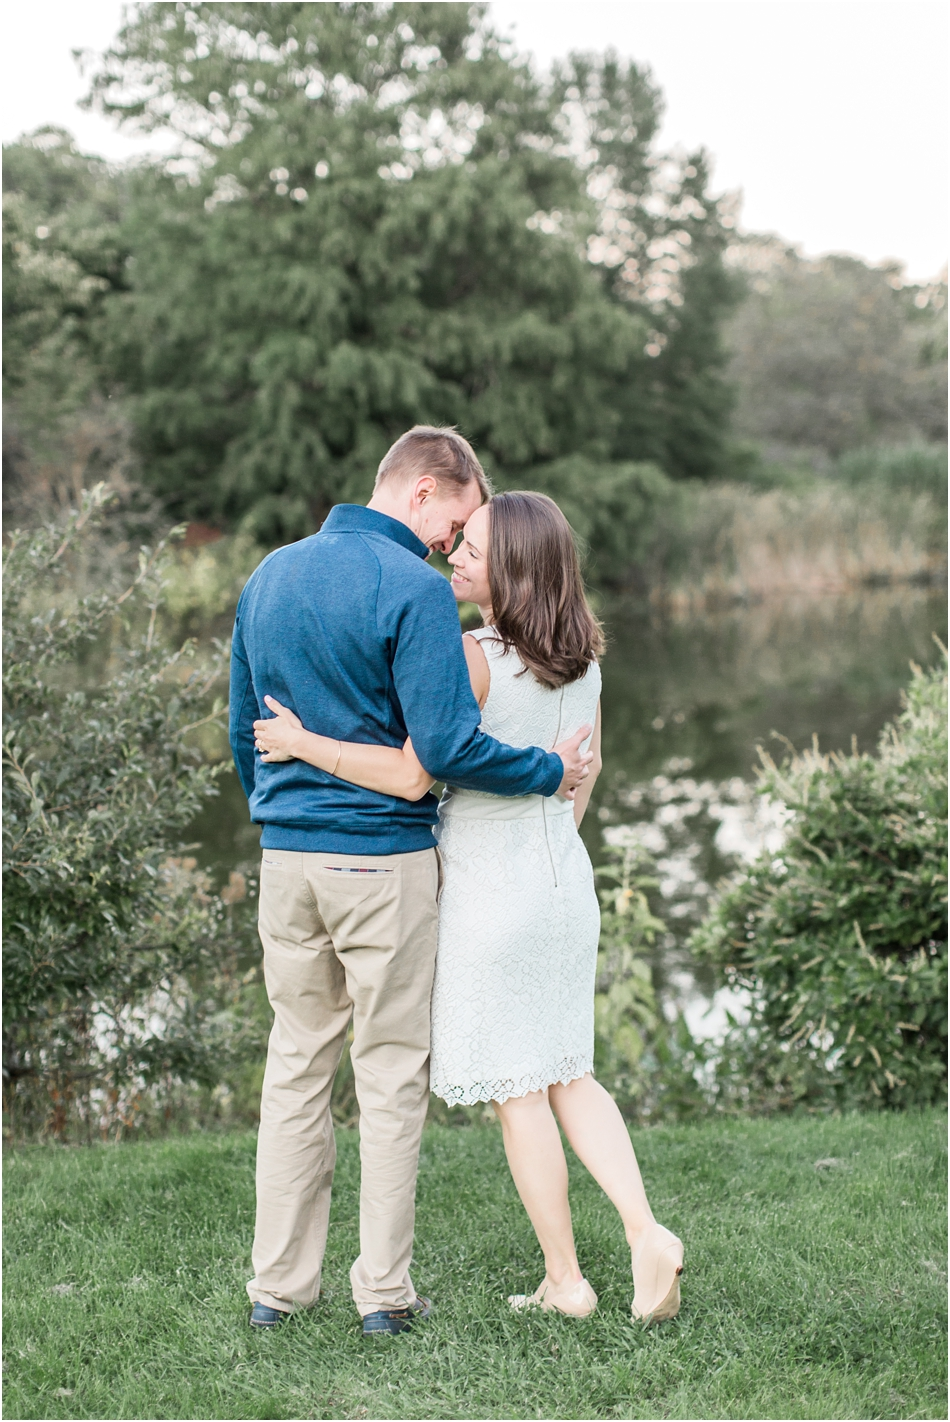 arnold_arboretum_engagement_dylan_mariana_cape_cod_boston_new_england_wedding_photographer_Meredith_Jane_Photography_photo_2667.jpg